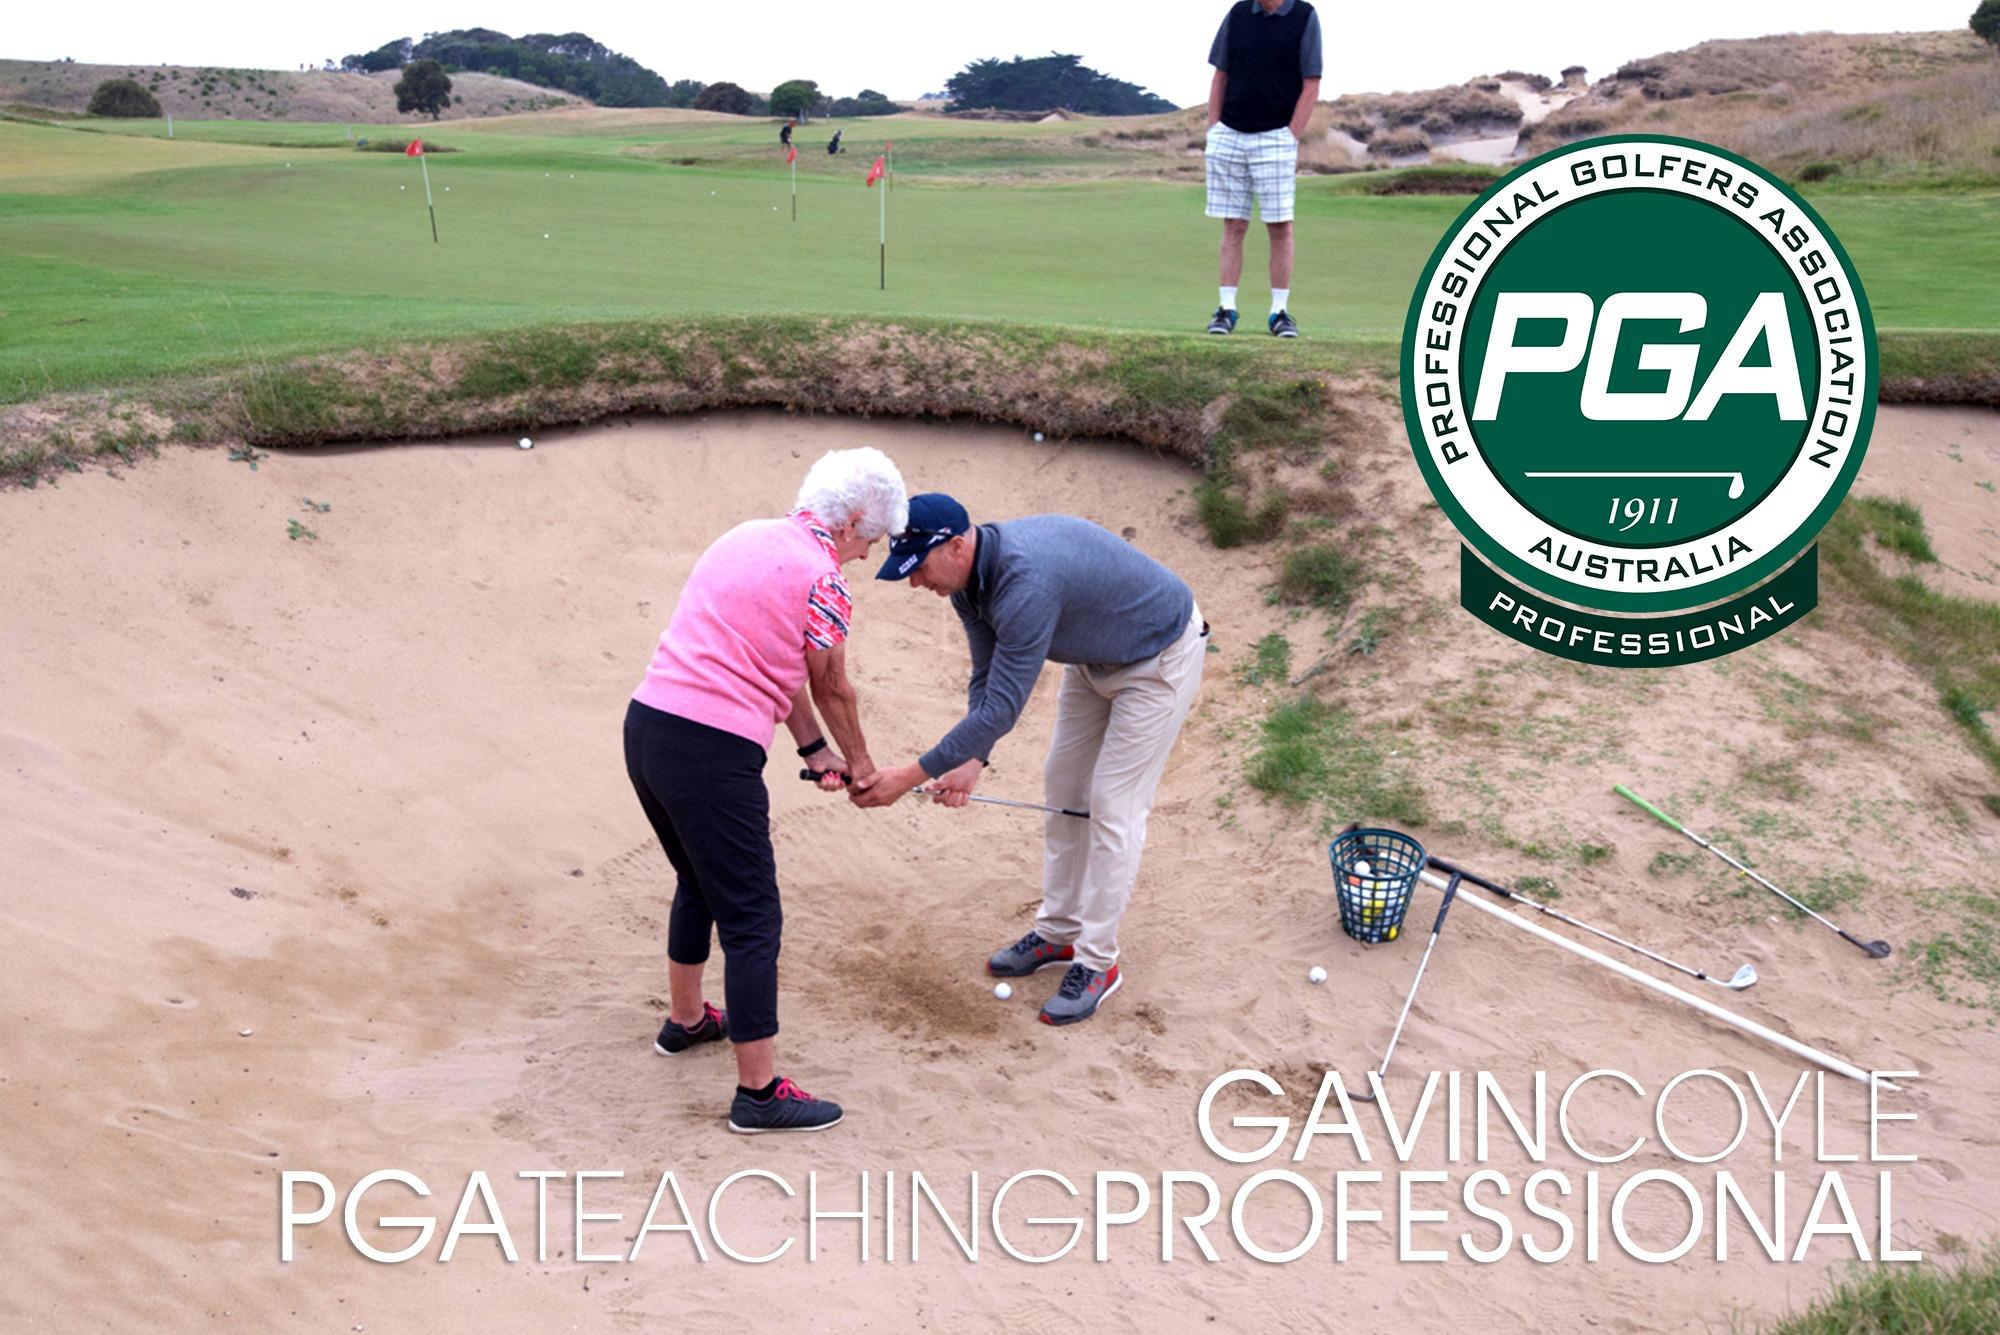 Gavin Coyle PGA Teaching Professional